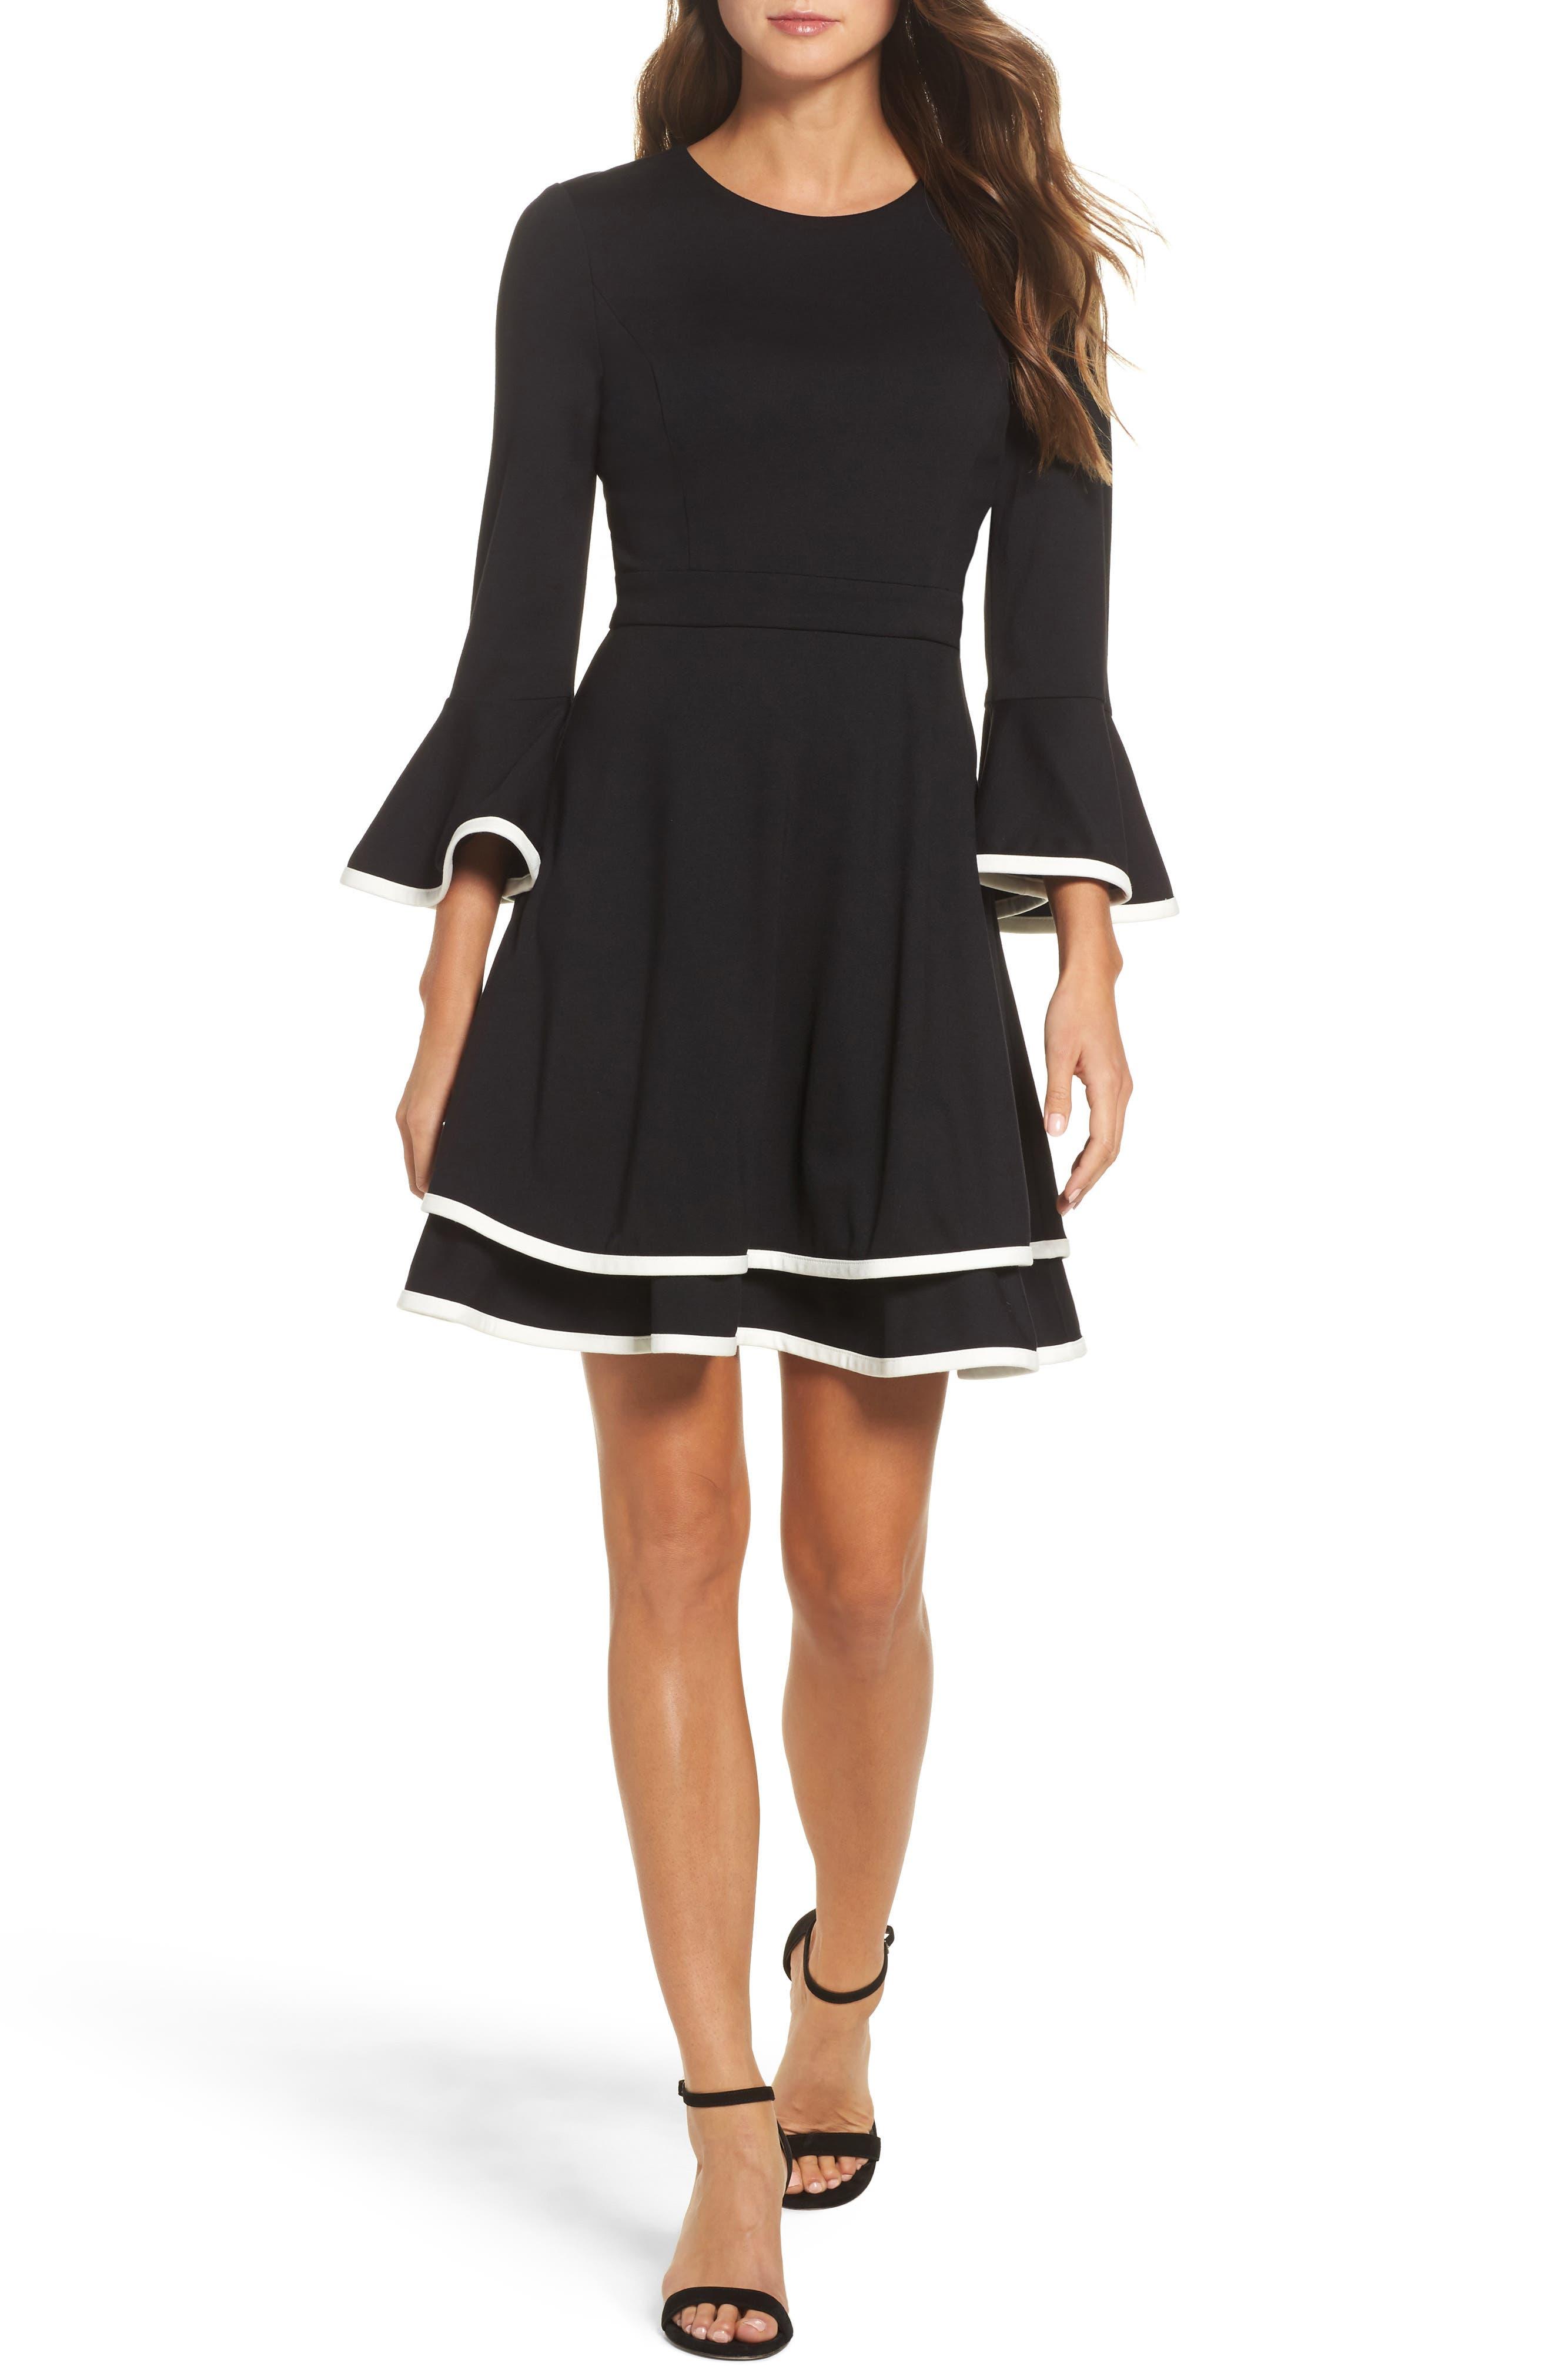 Simple Black Dress for Teens Funeral